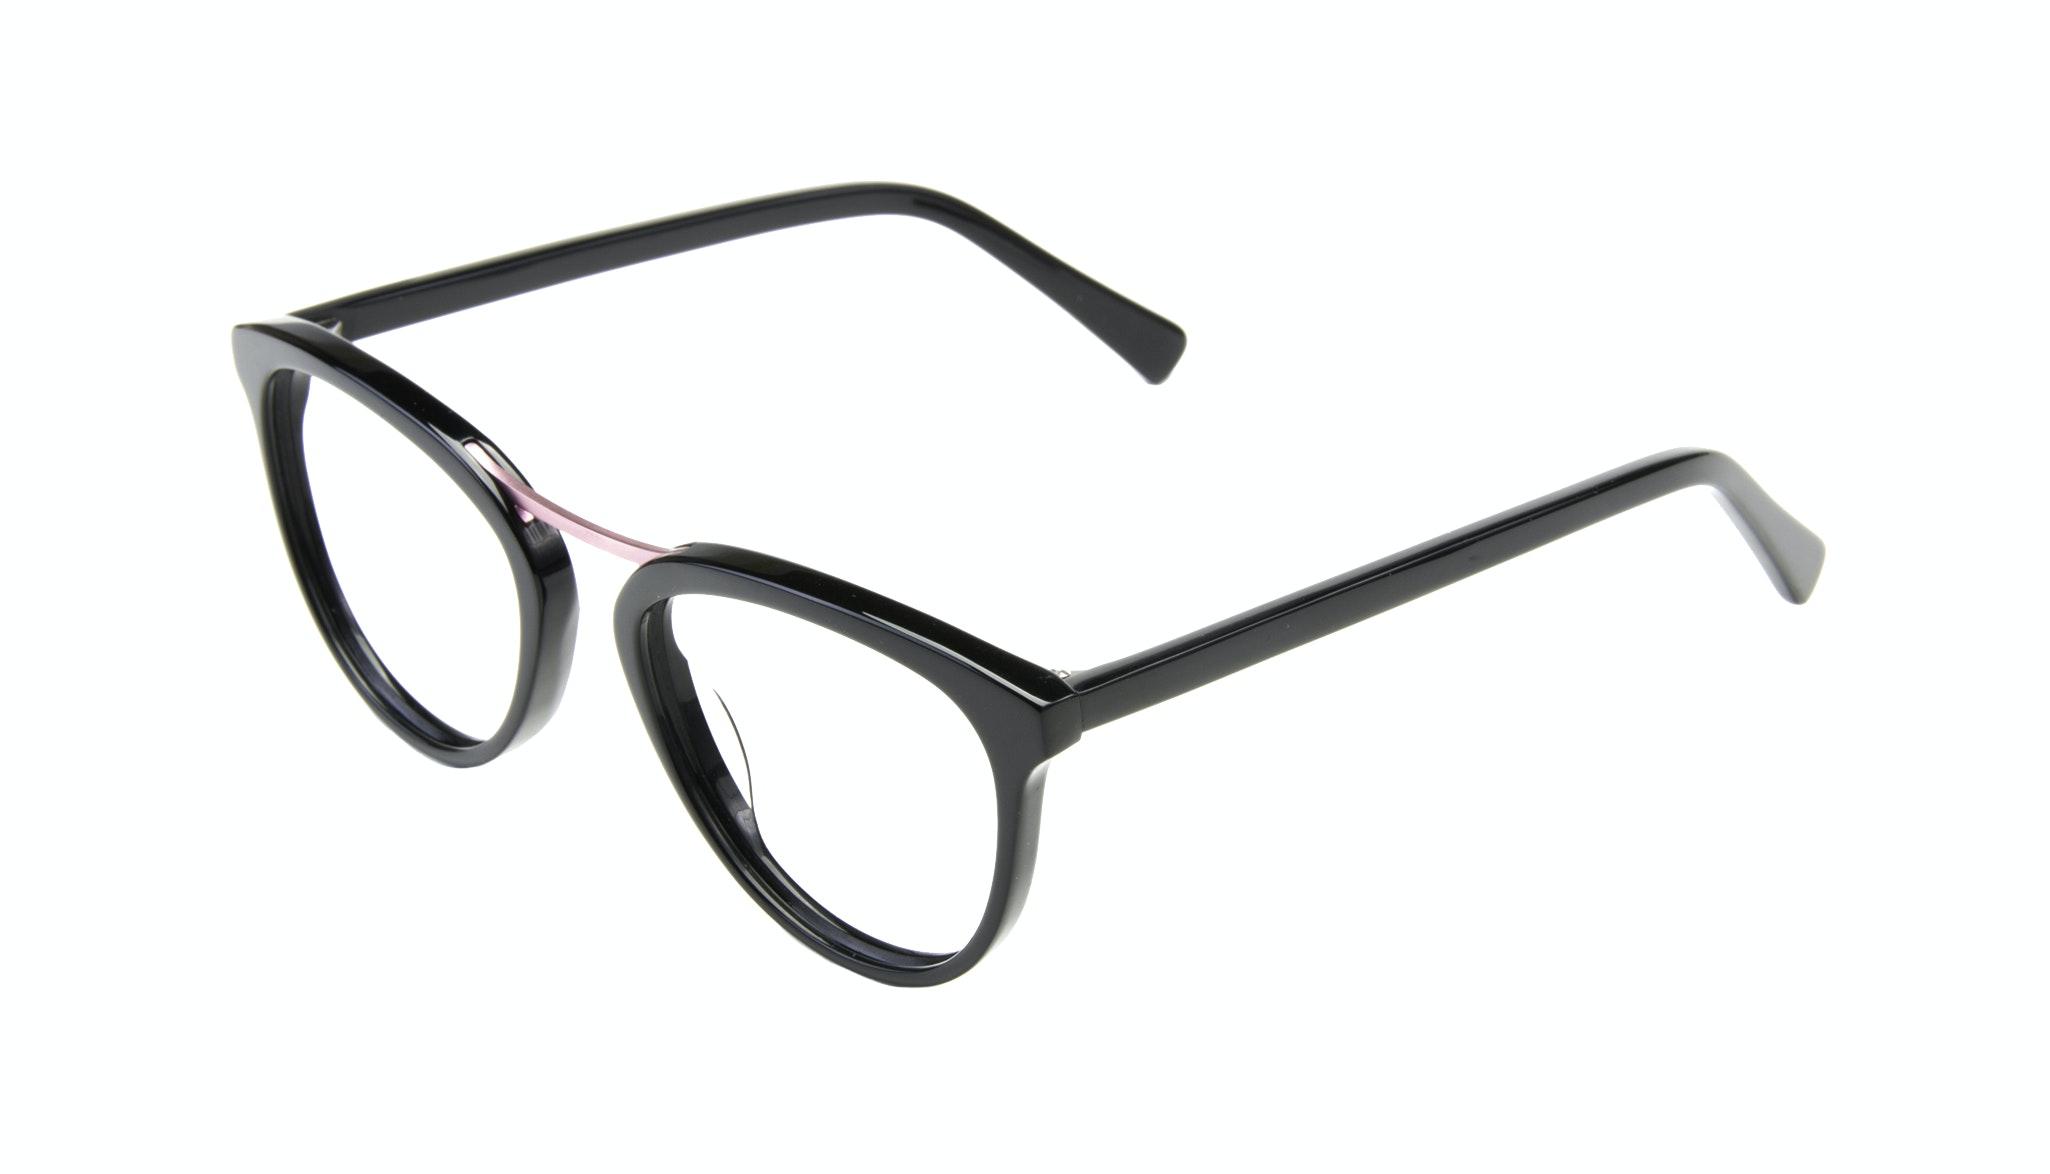 Affordable Fashion Glasses Cat Eye Round Eyeglasses Women Reef Deep Shell Tilt